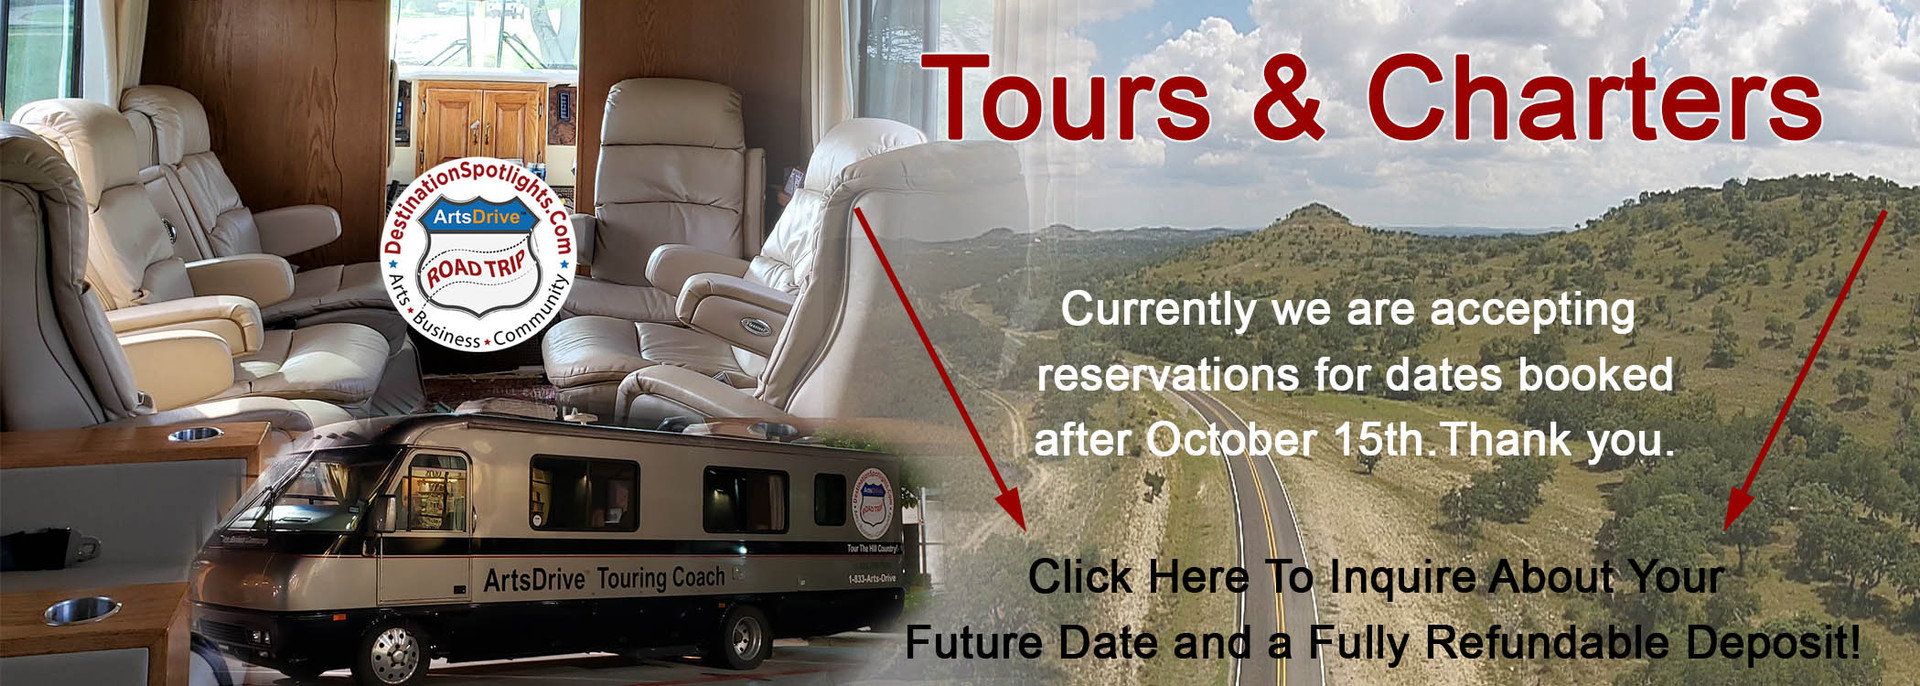 ArtsDrive Touring Coach